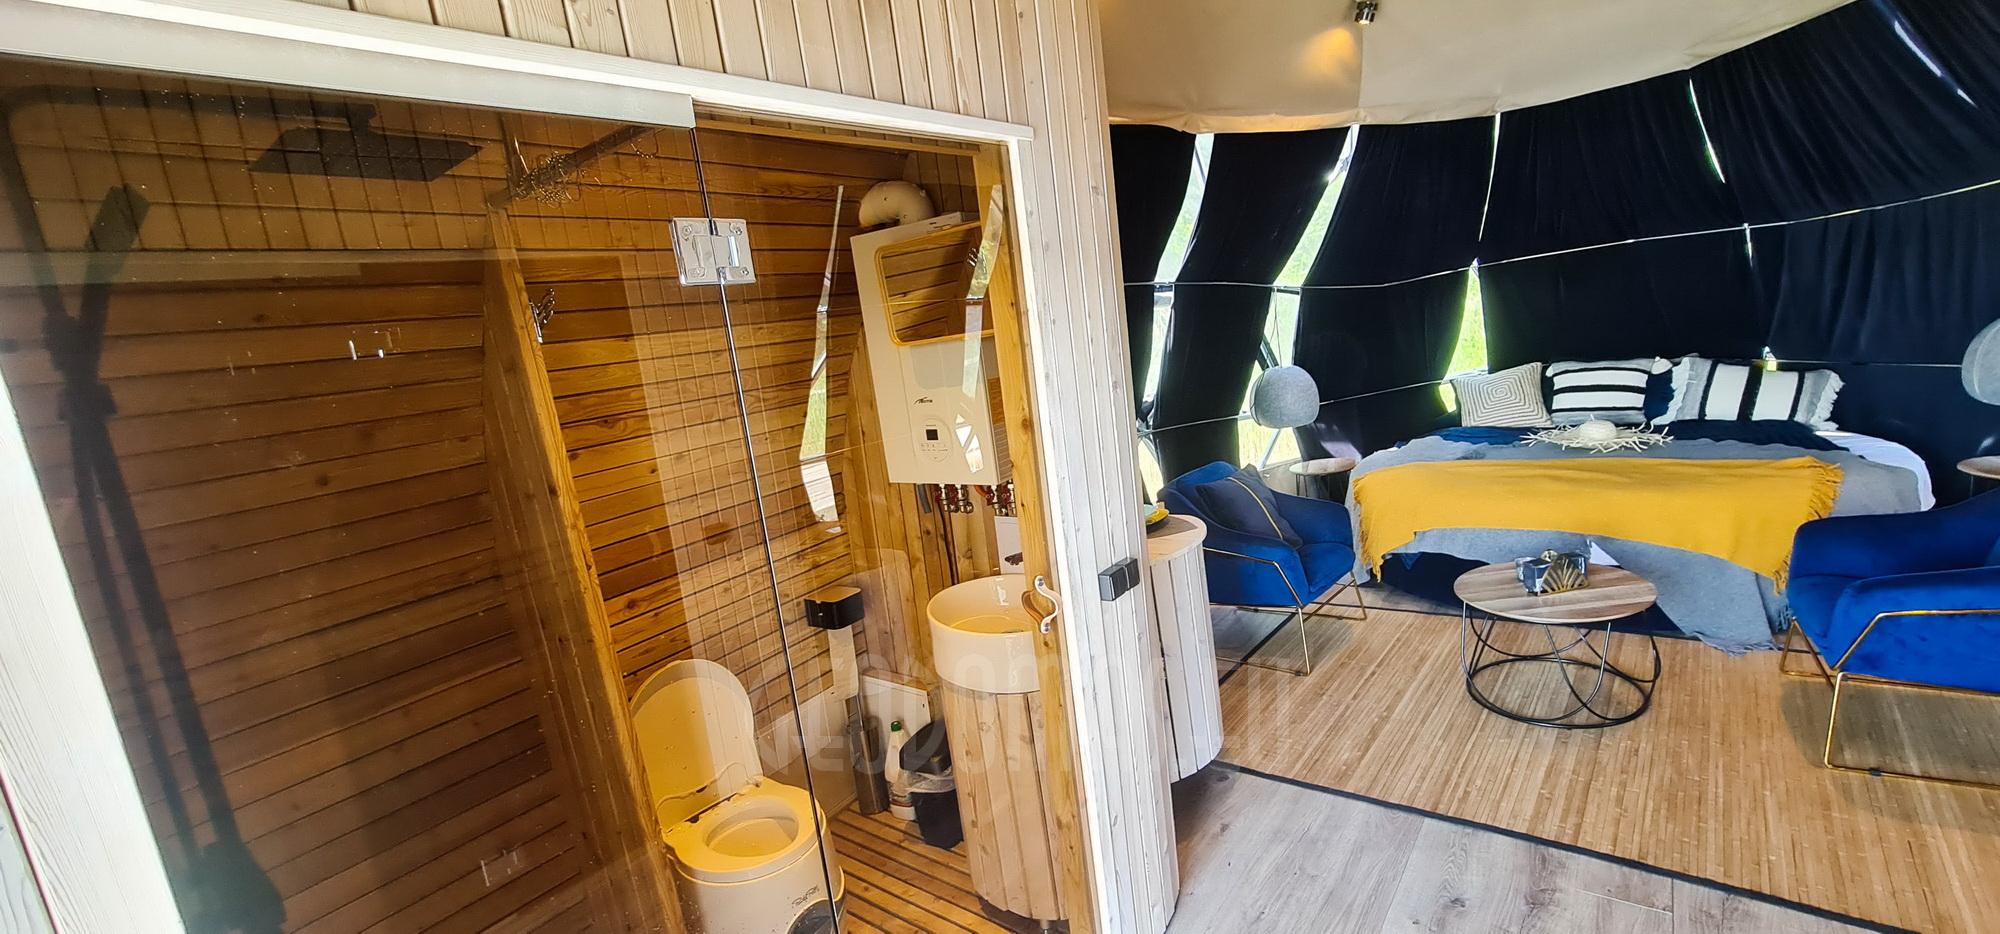 27m² Luxury Glamping Yacht   Floating Dome Ø7m, Trakai LT